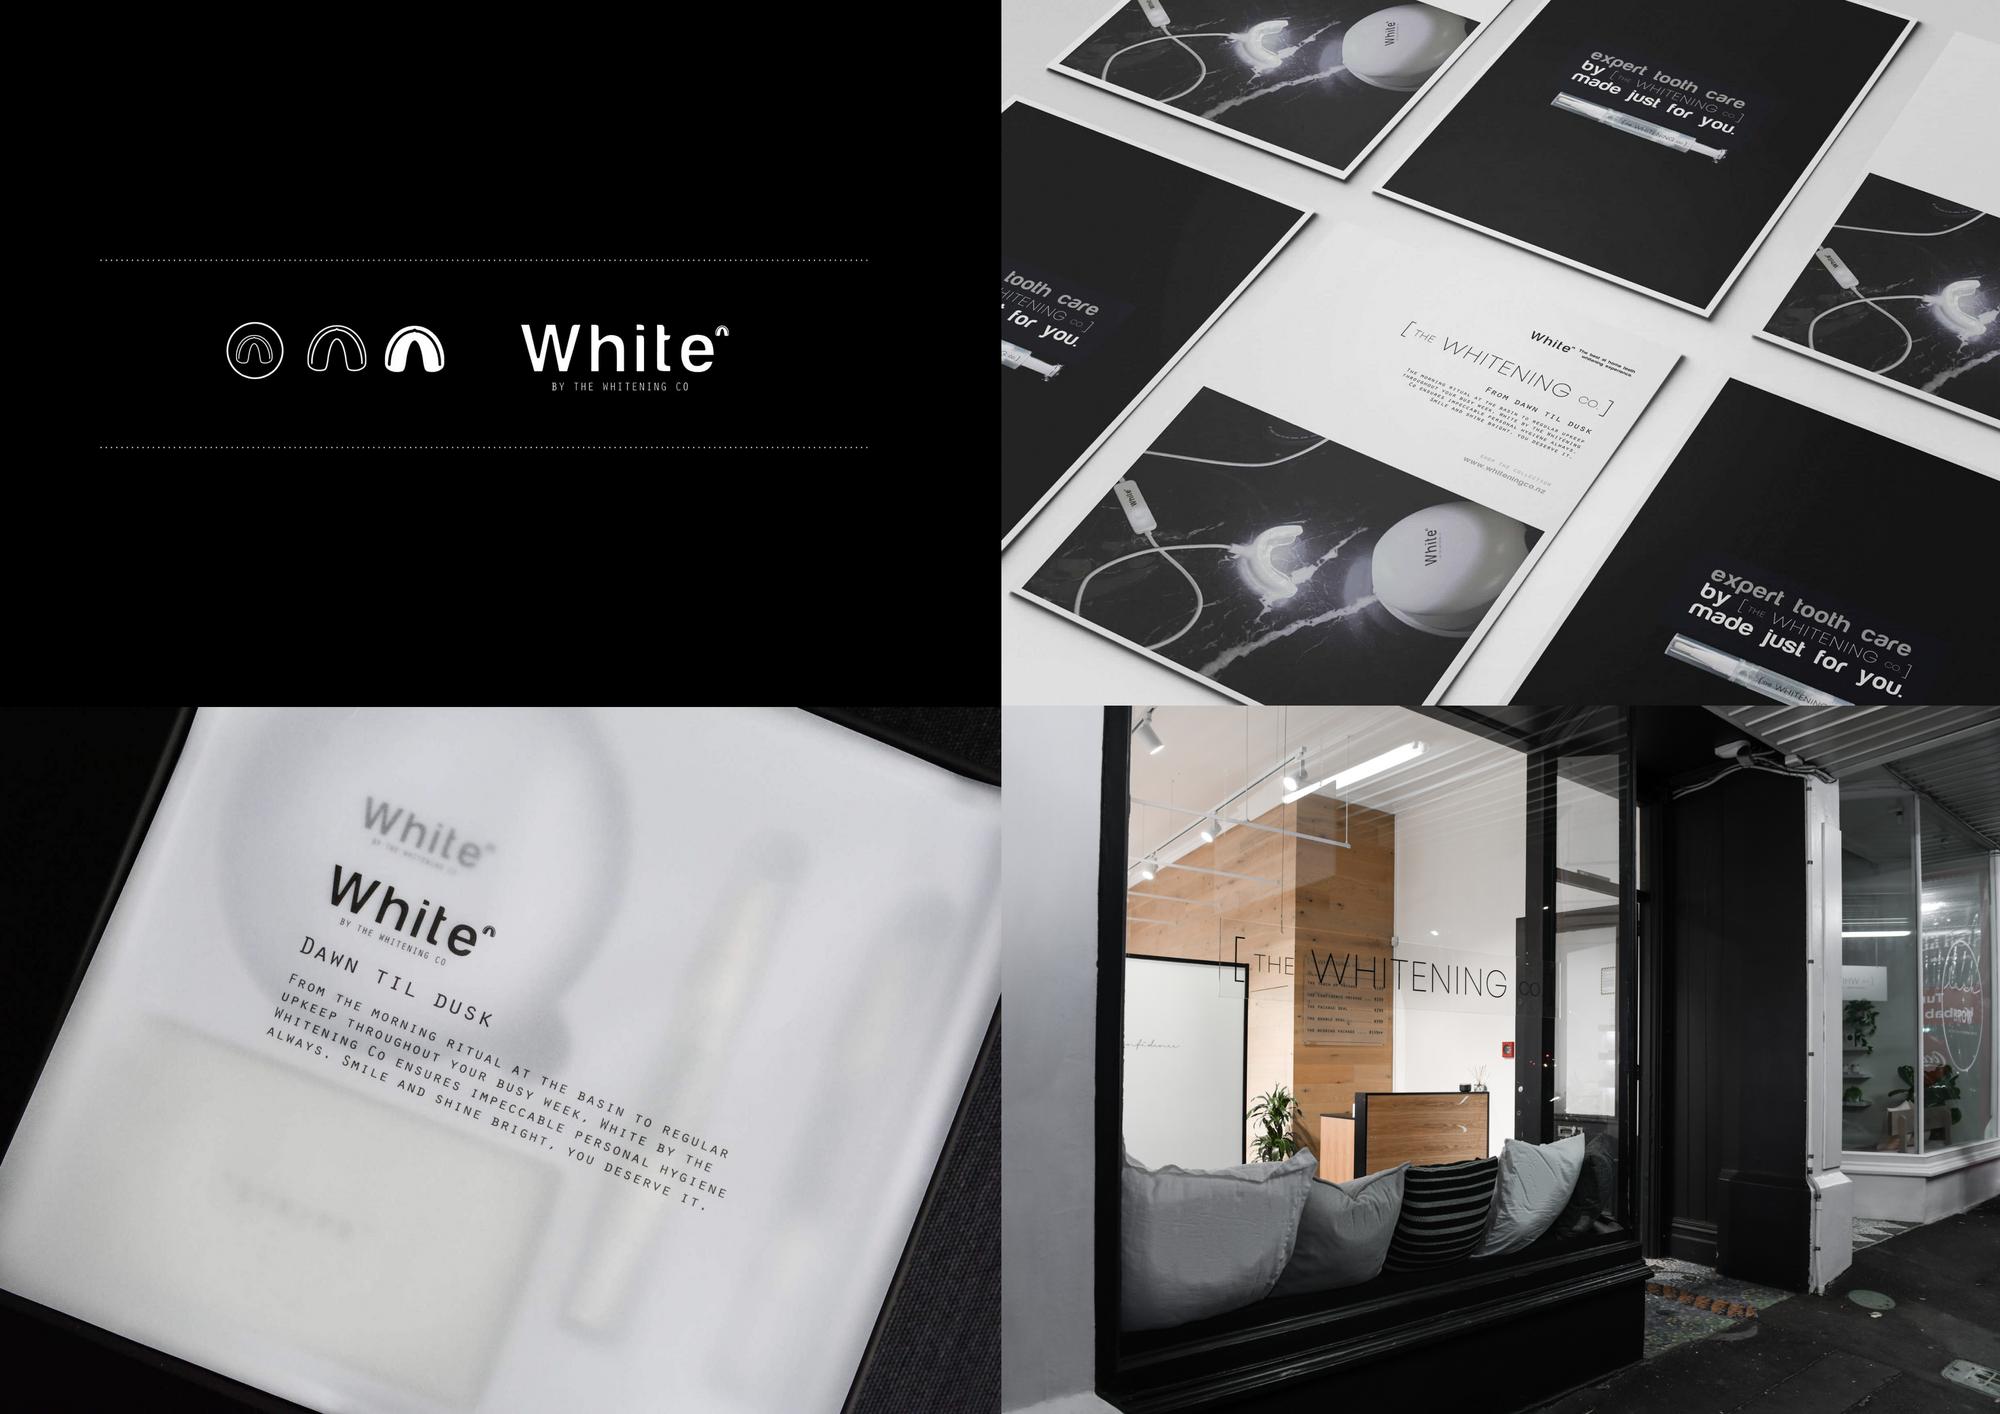 The Whitening Co - digital marketing